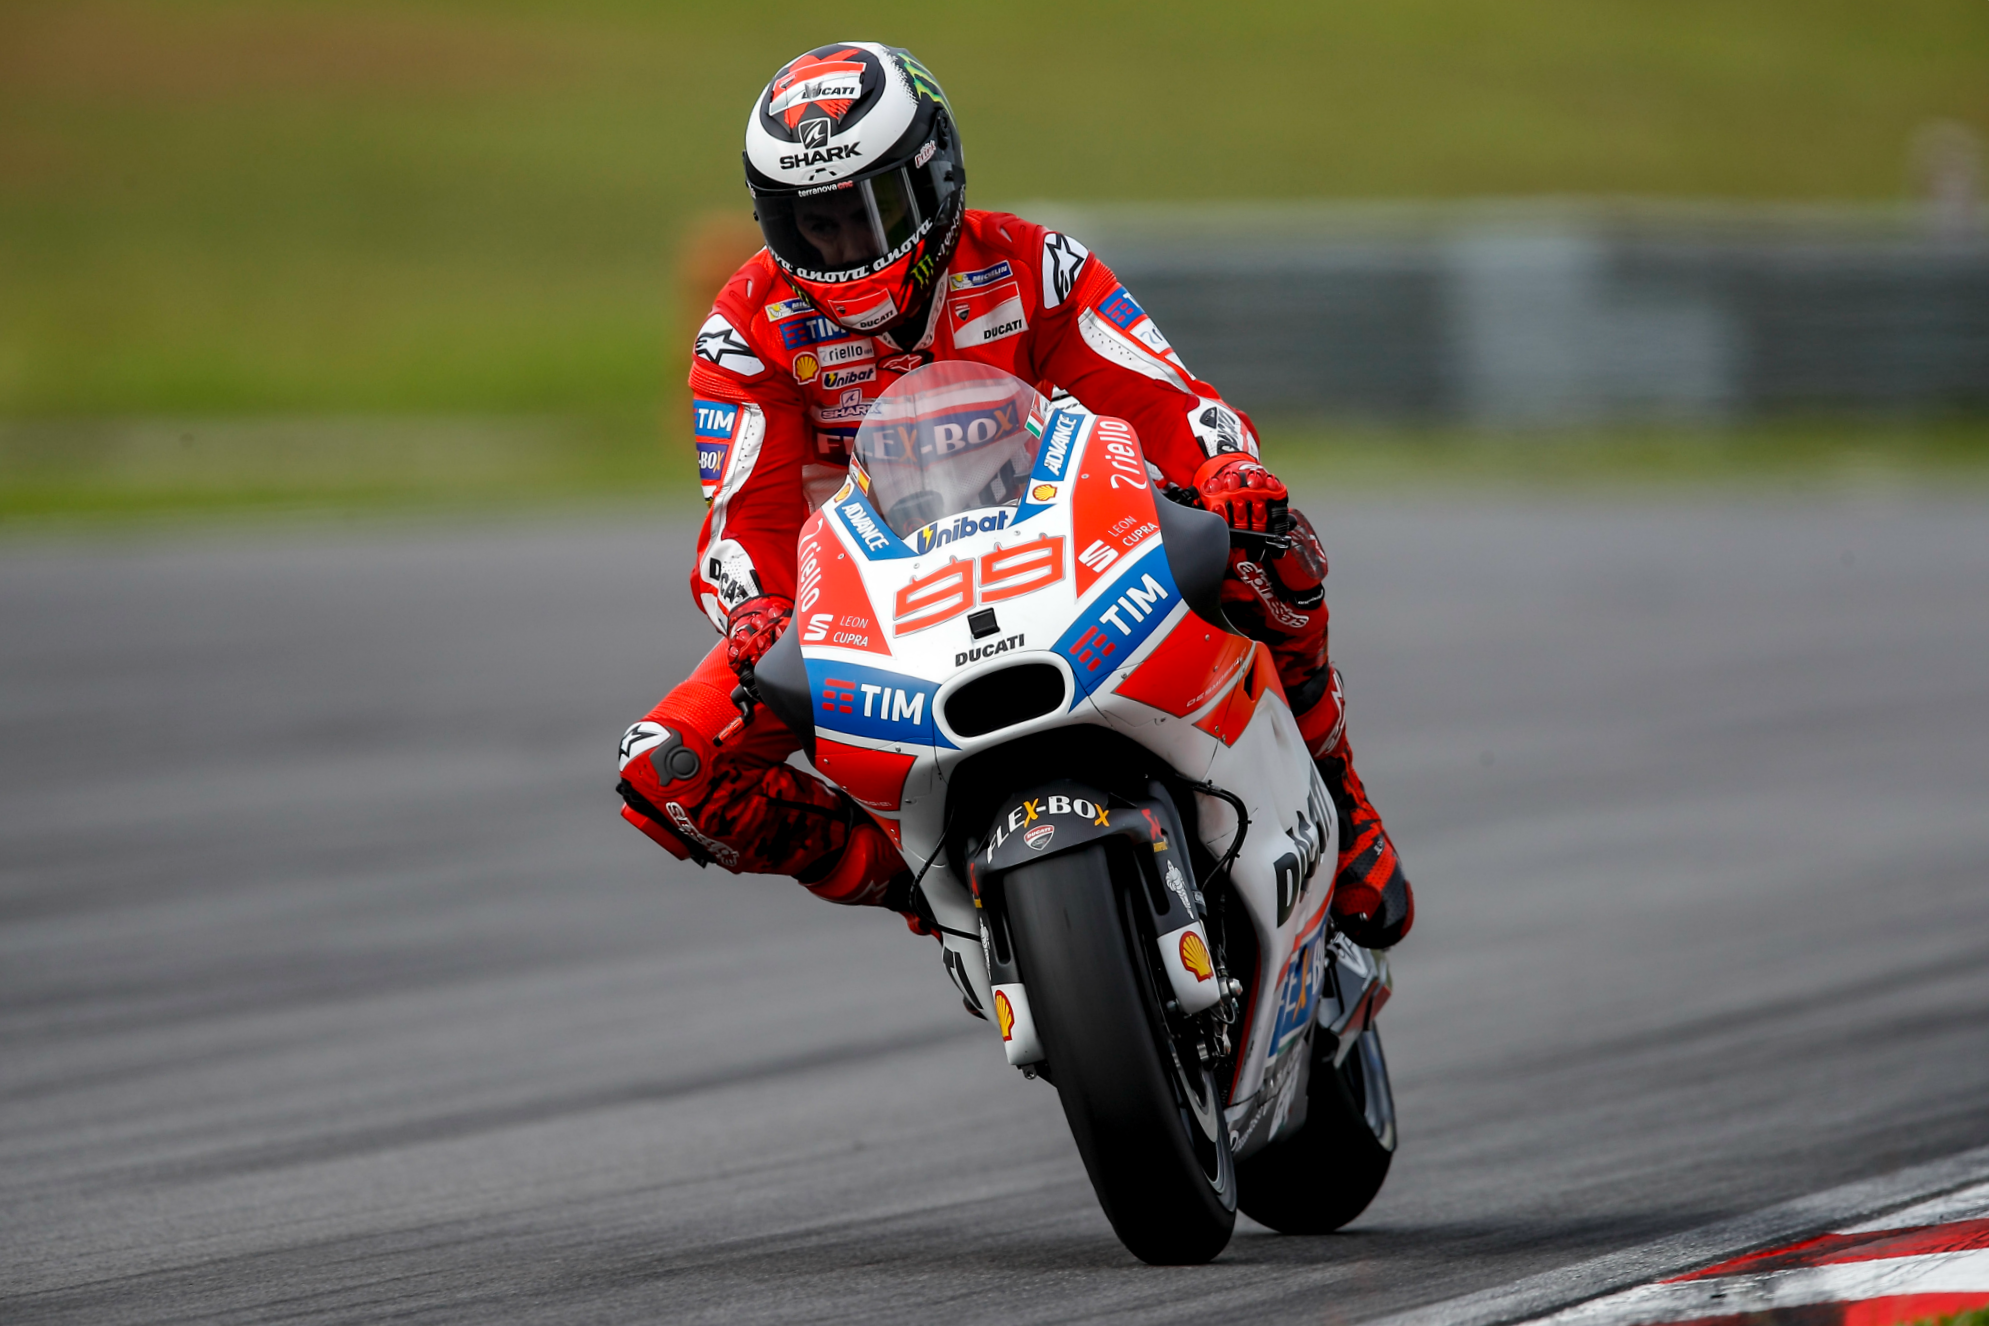 Jorge Lorenzo (Ducati Team) lors des tests IRTA le 1er février 2017